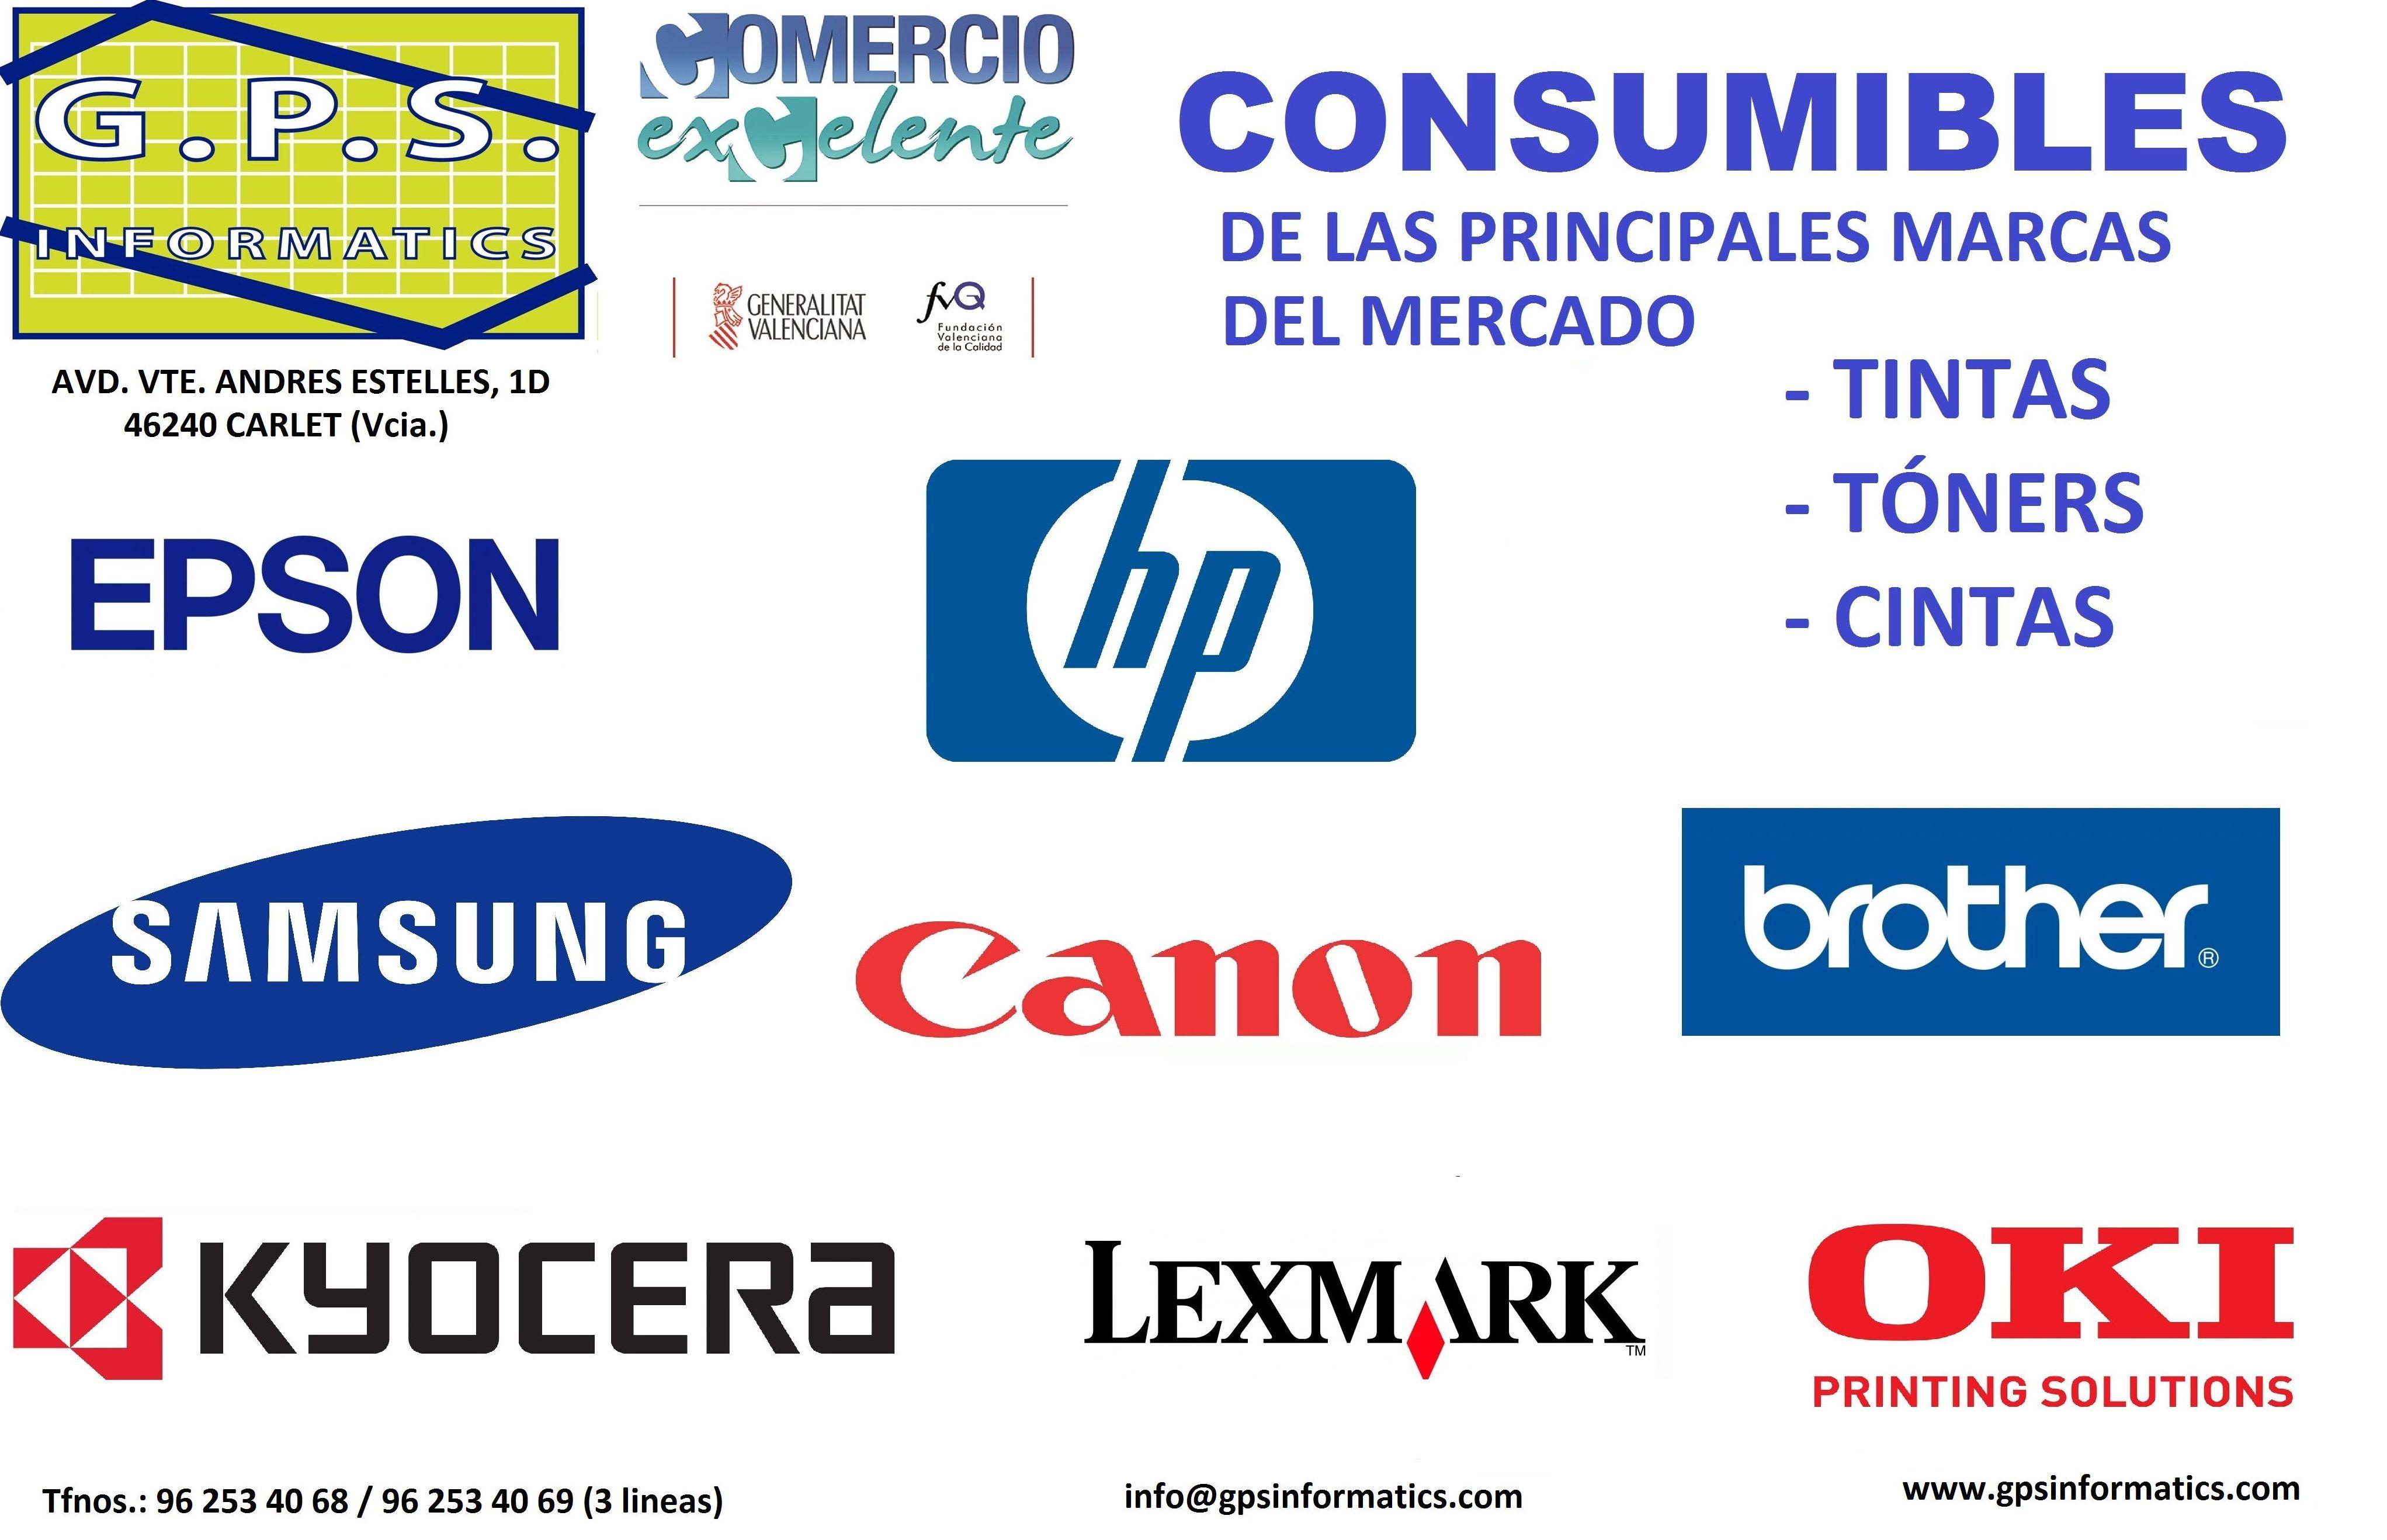 Foto 1 de Informática (hardware y software) en Carlet | G.P.S. Informàtics, S.L.